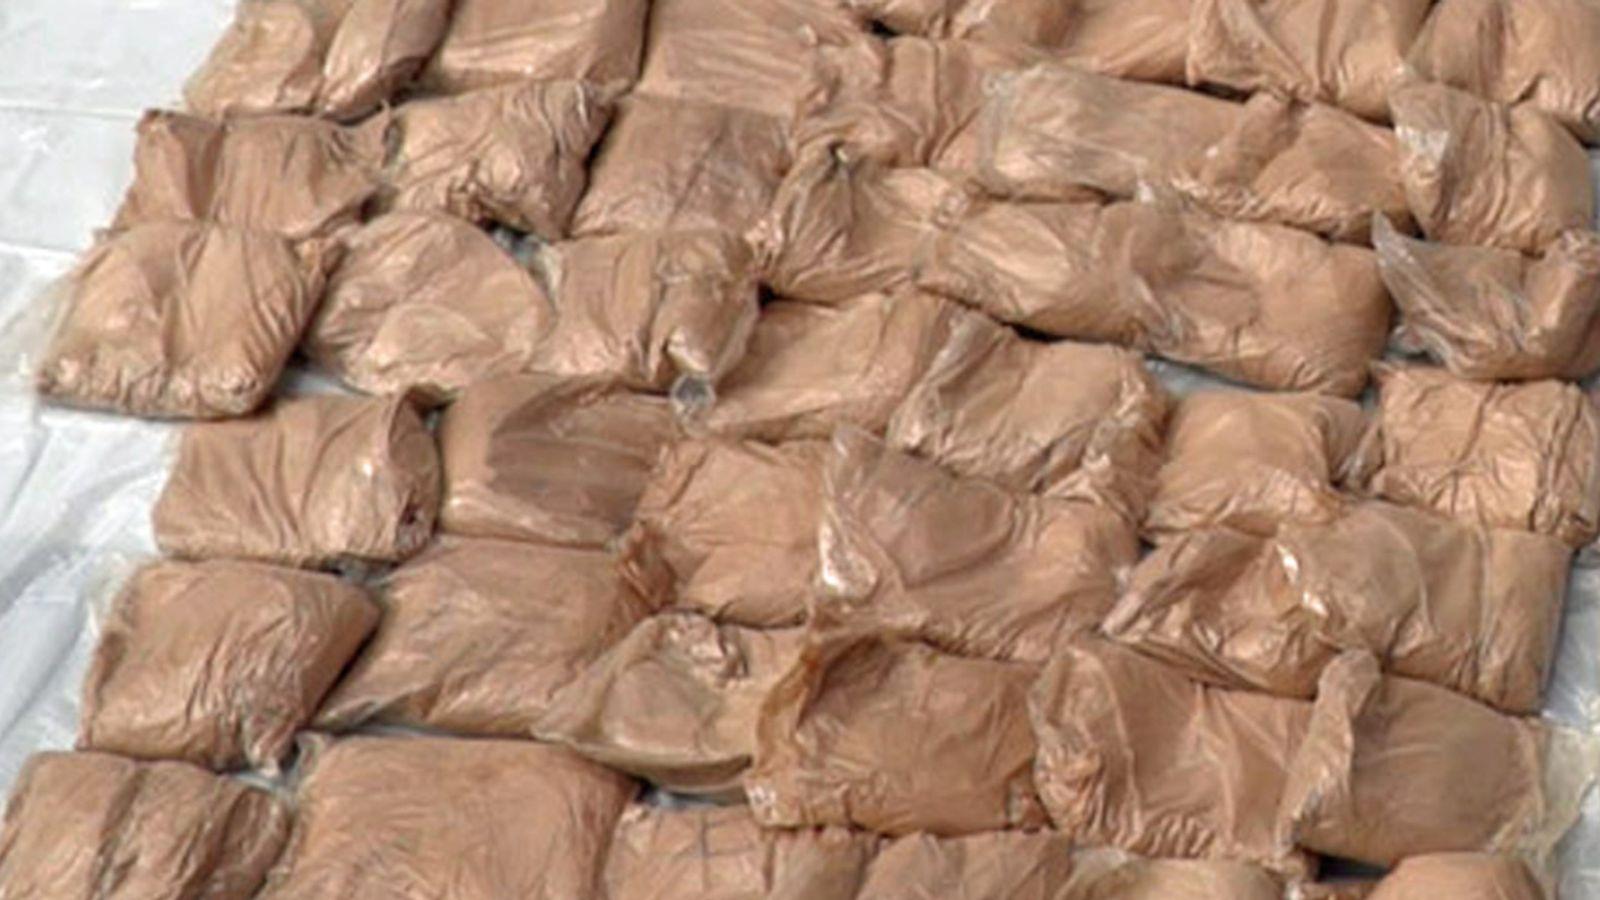 Dark web crackdown on opioid traffickers triggers 179 arrests